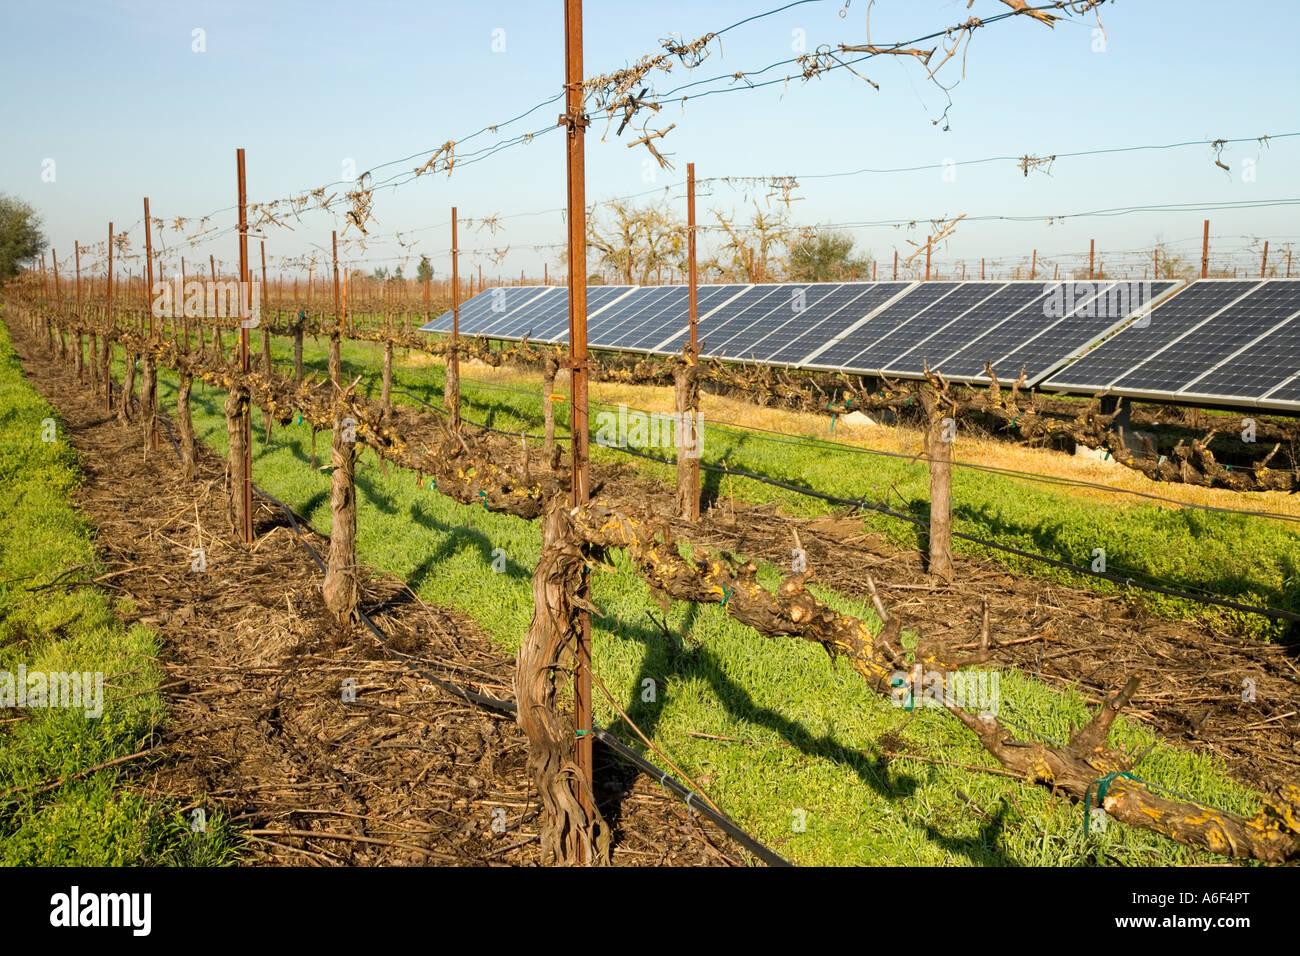 Solar panels in dormant vineyard, Califorrnia - Stock Image